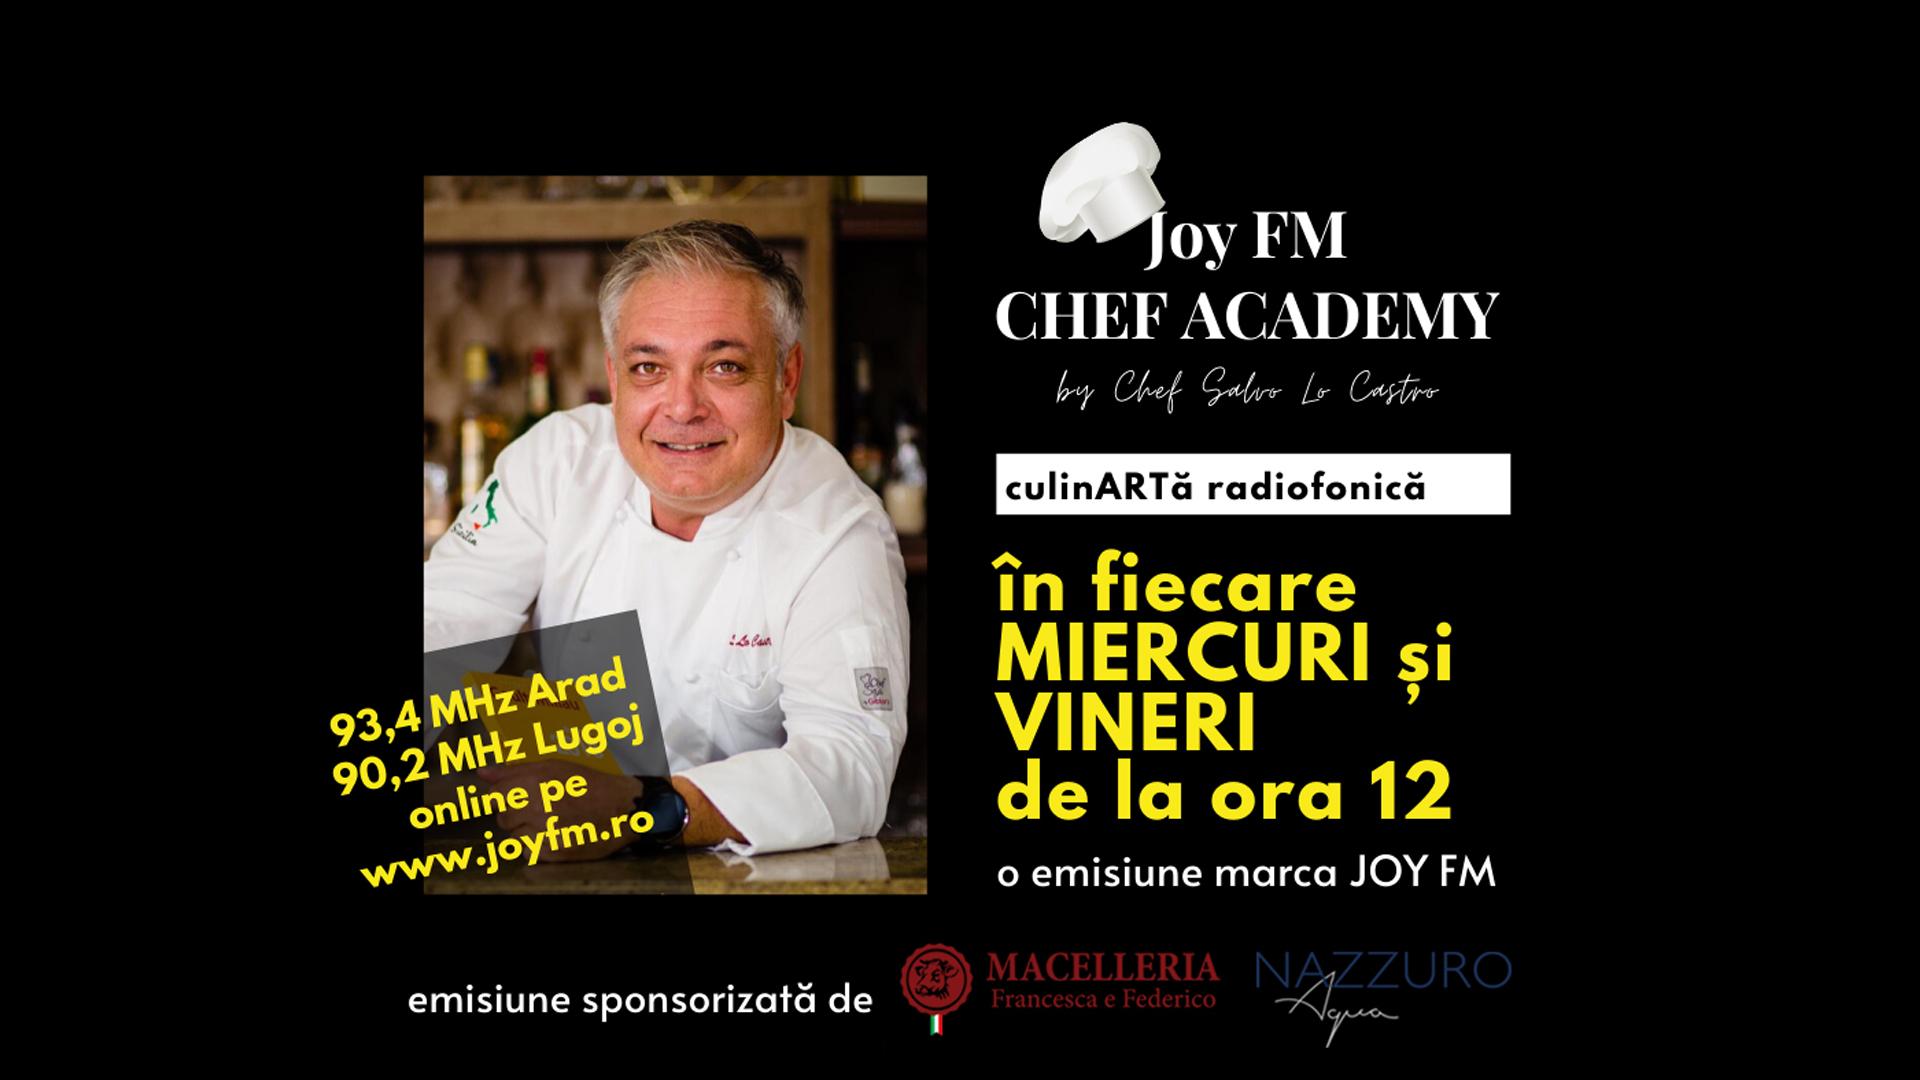 Joy FM Chef Academy